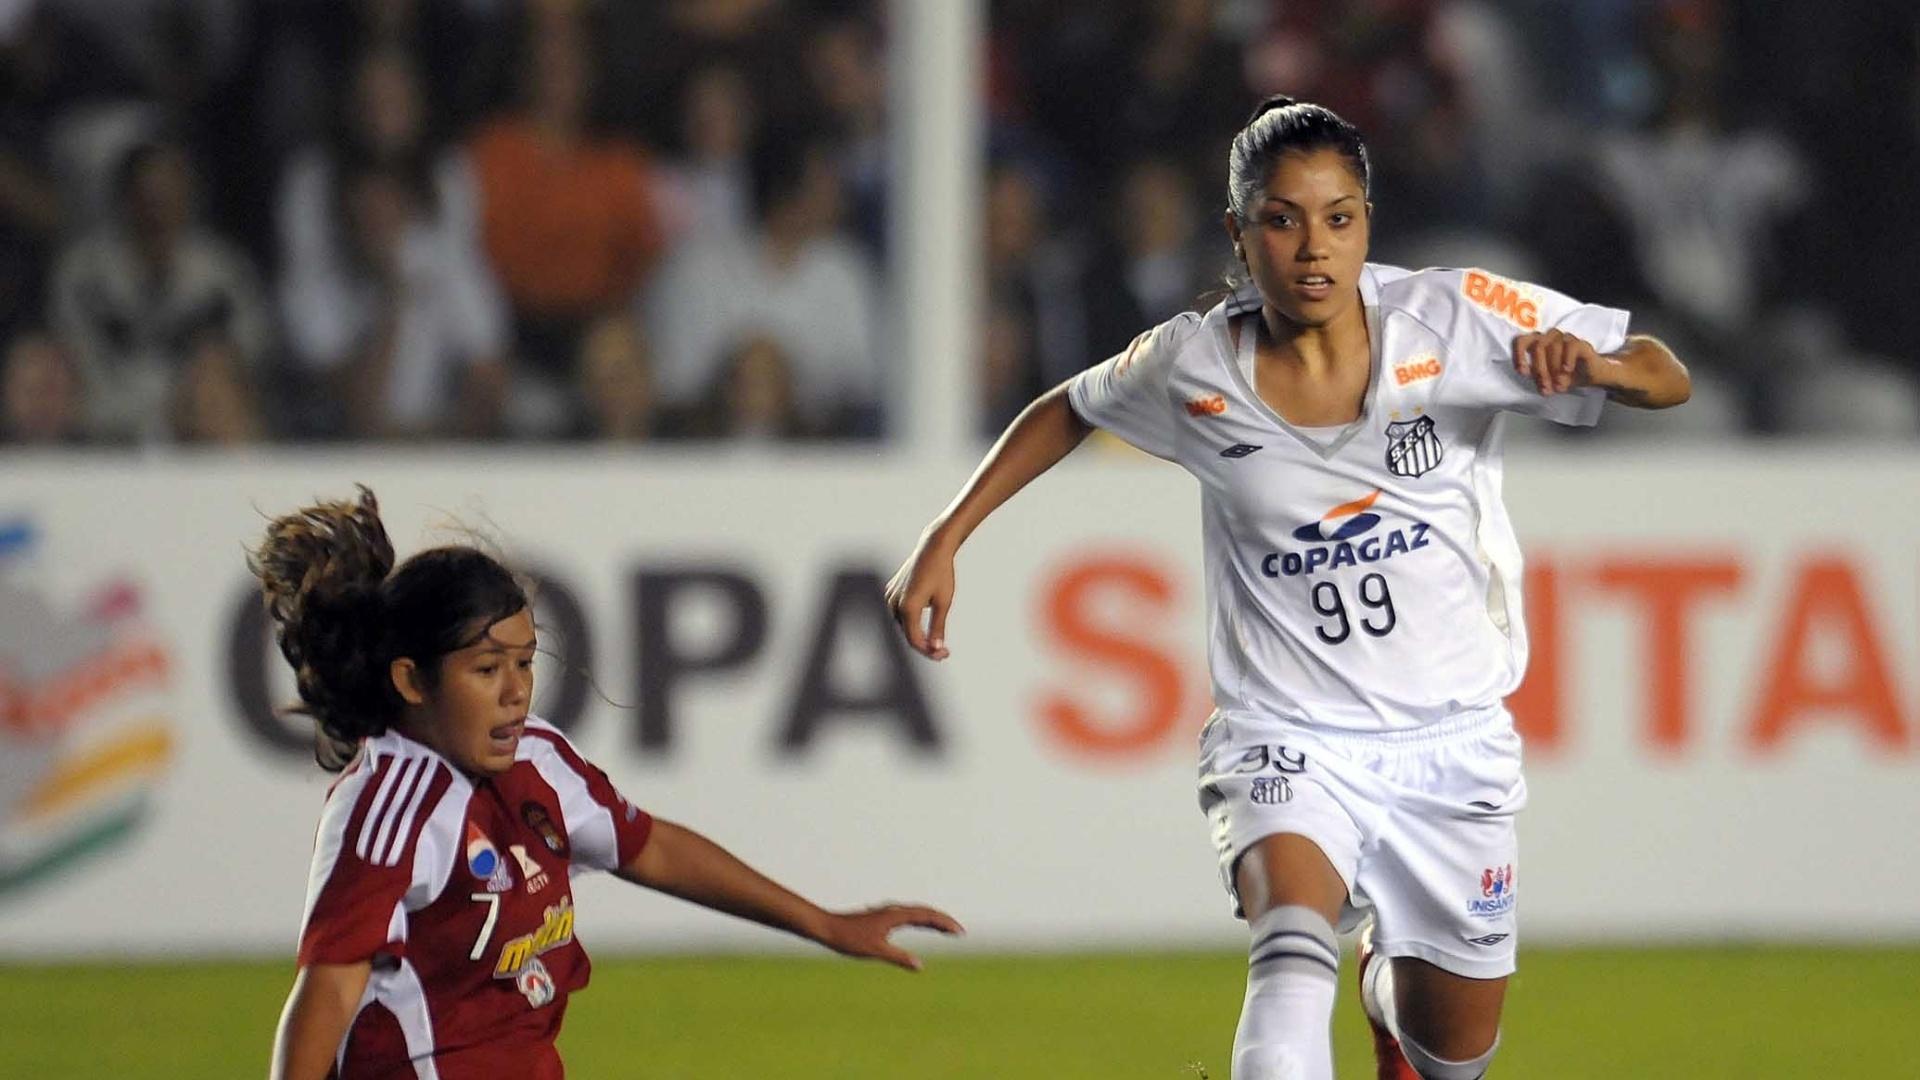 Maurine está entre as jogadoras brasileiras convocadas para o Pan